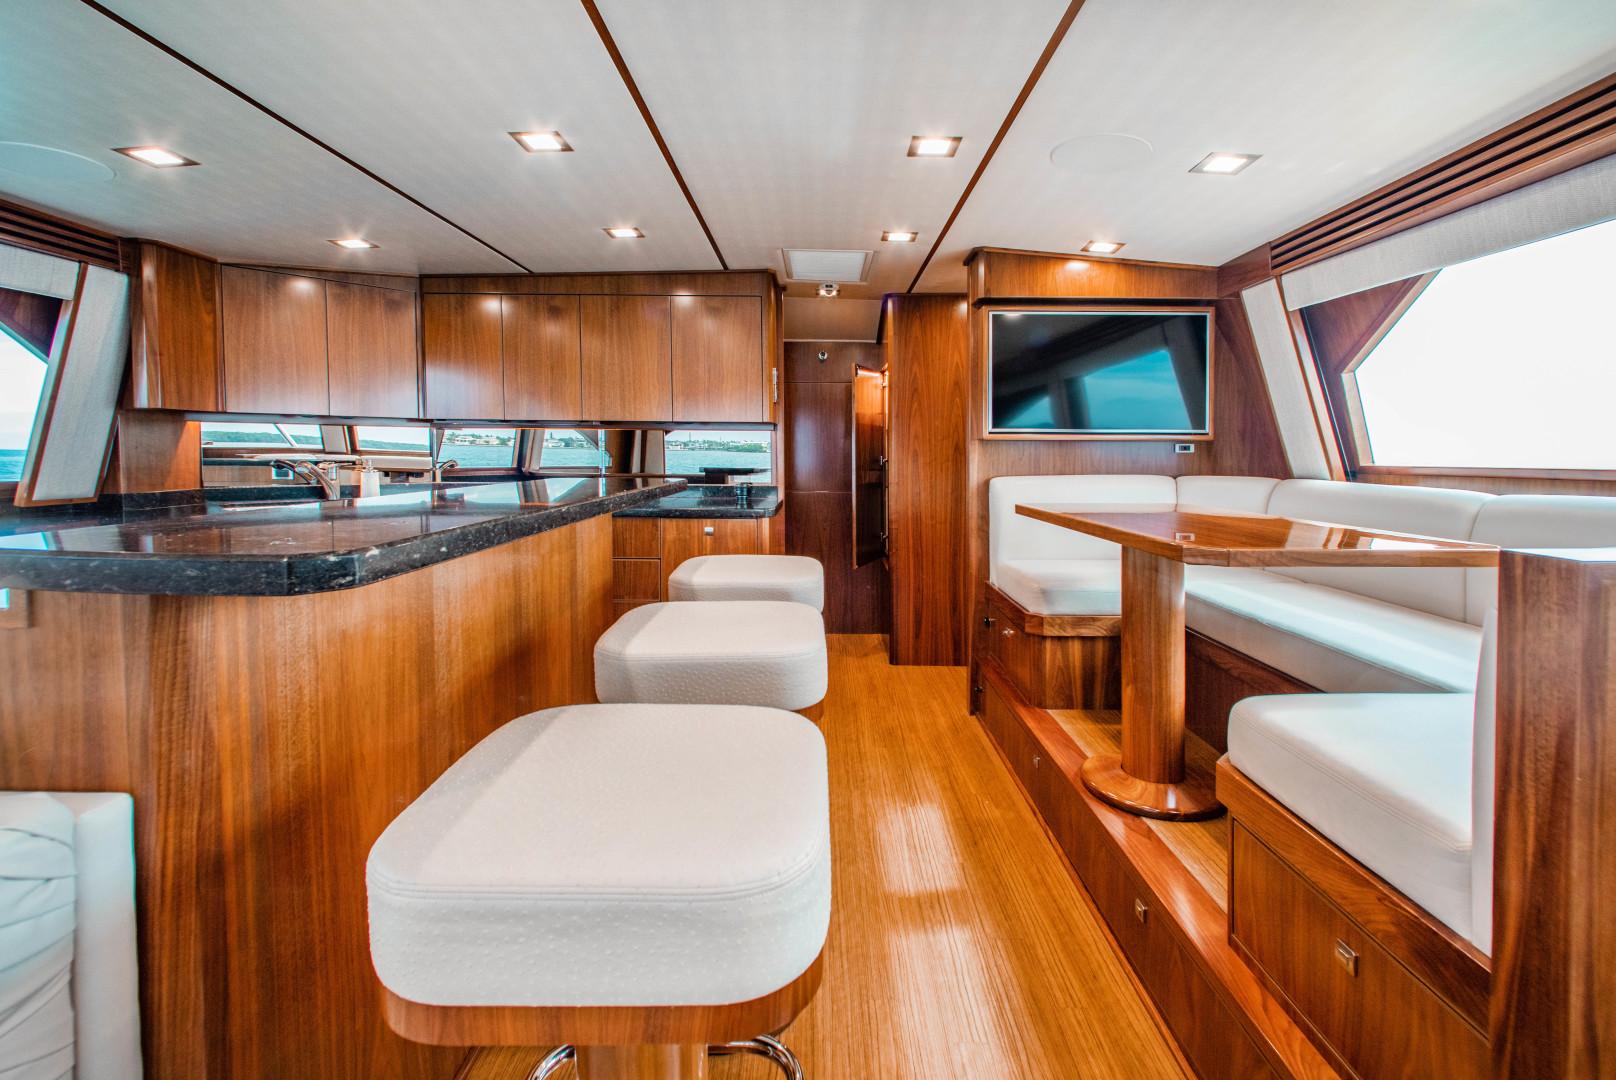 Viking-72 Enclosed Bridge 2018-Red Lion Ocean Reef-Florida-United States-2018 Viking 72 Enclosed Bridge  Red Lion  Galley / Dinette-1568241   Thumbnail